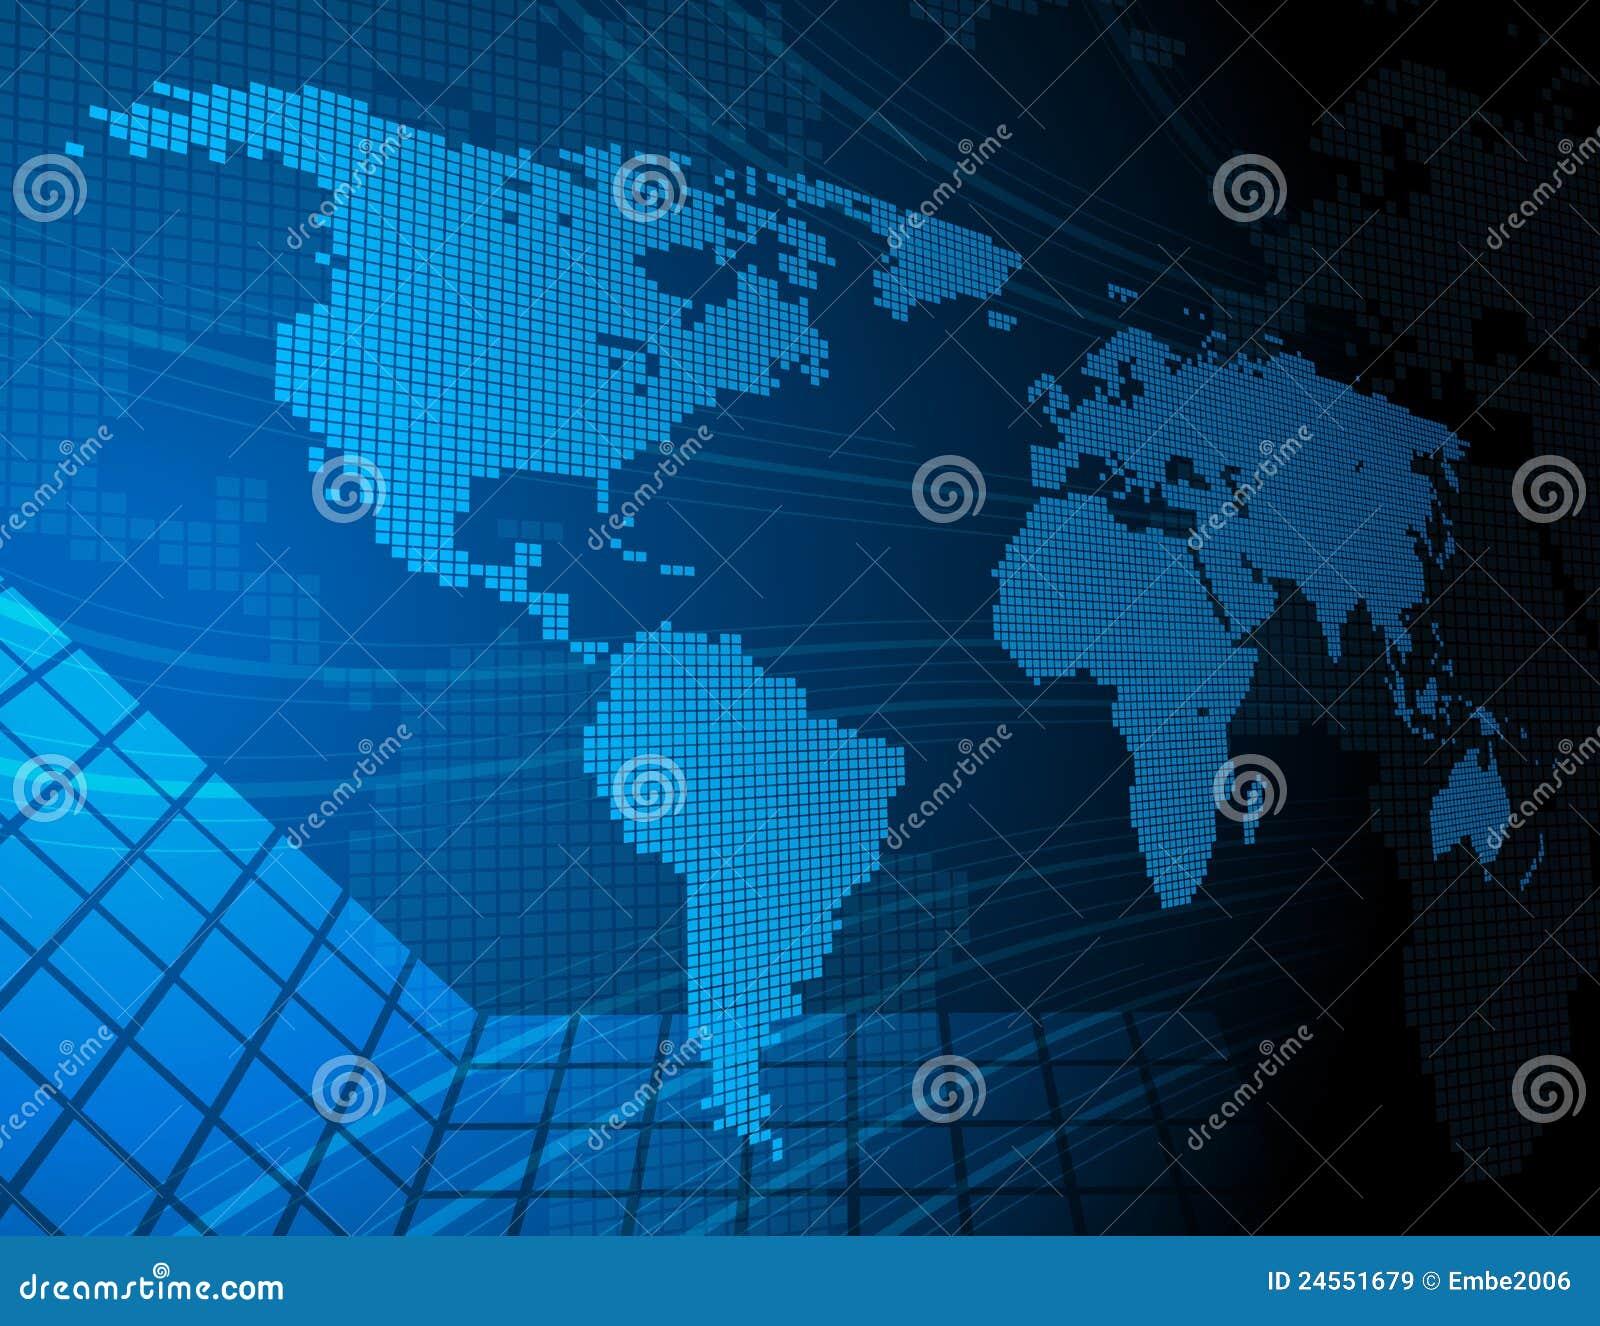 Digital-Weltkarte